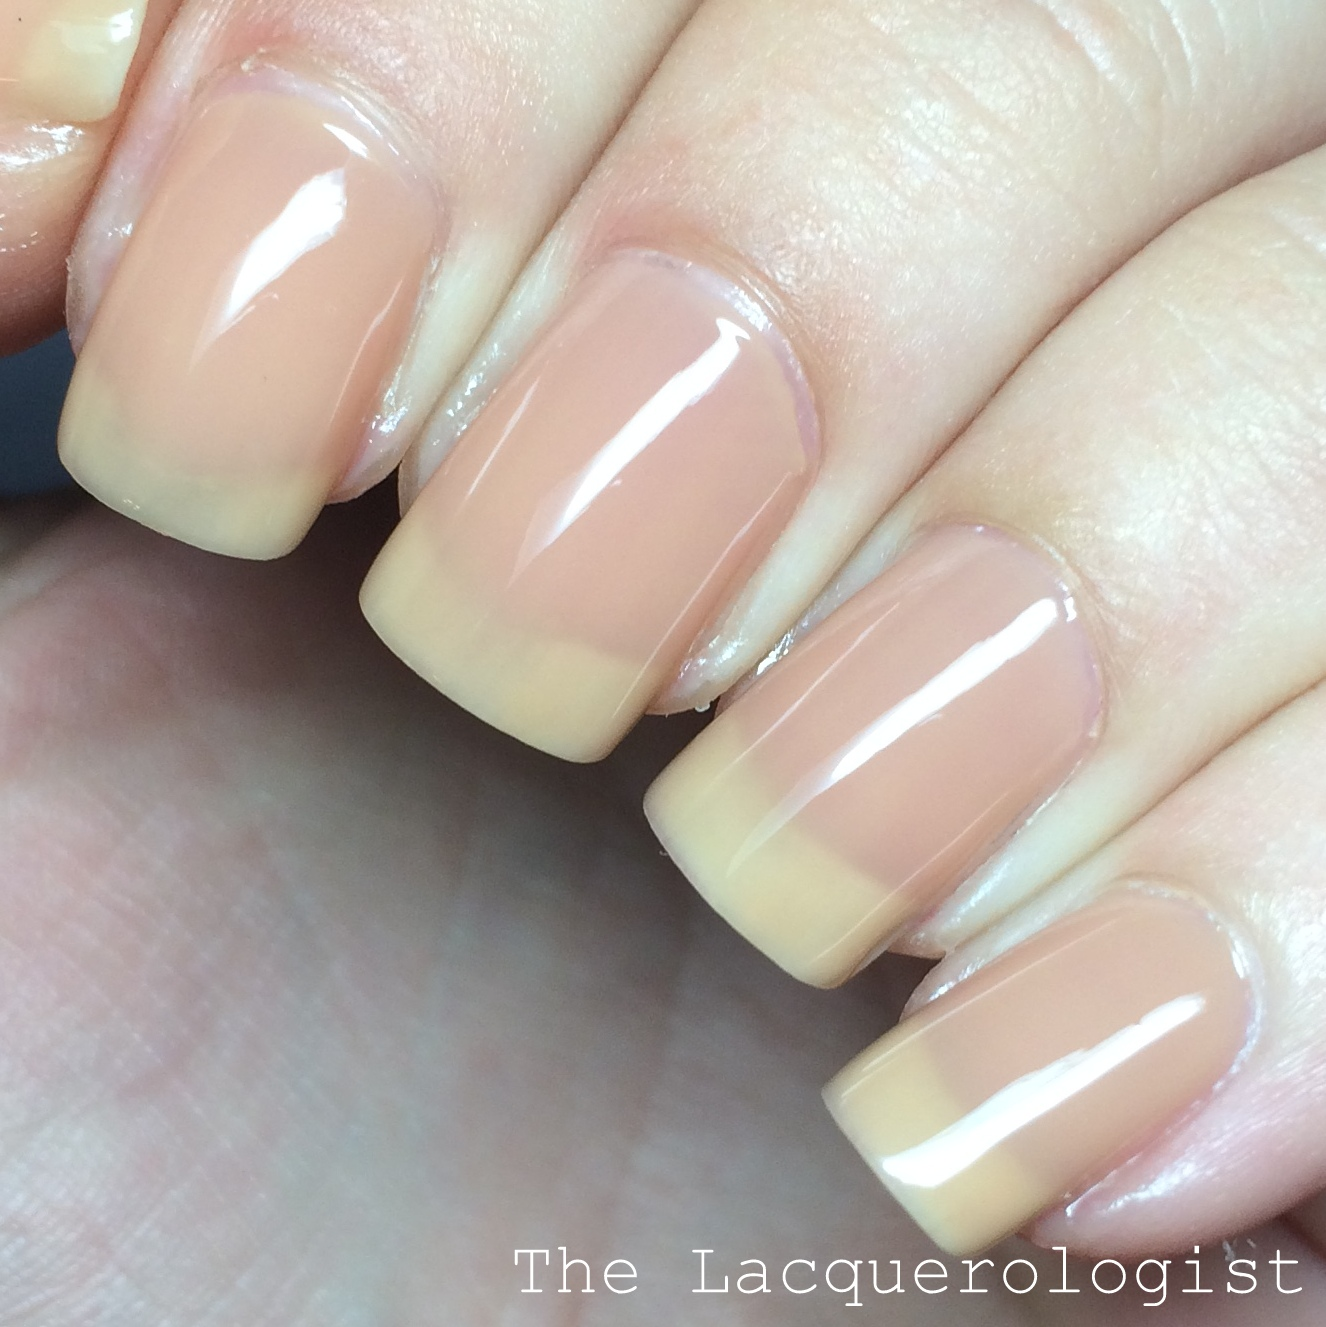 Sally hansen complete salon manicure fall 2015 designer for Salon complet but